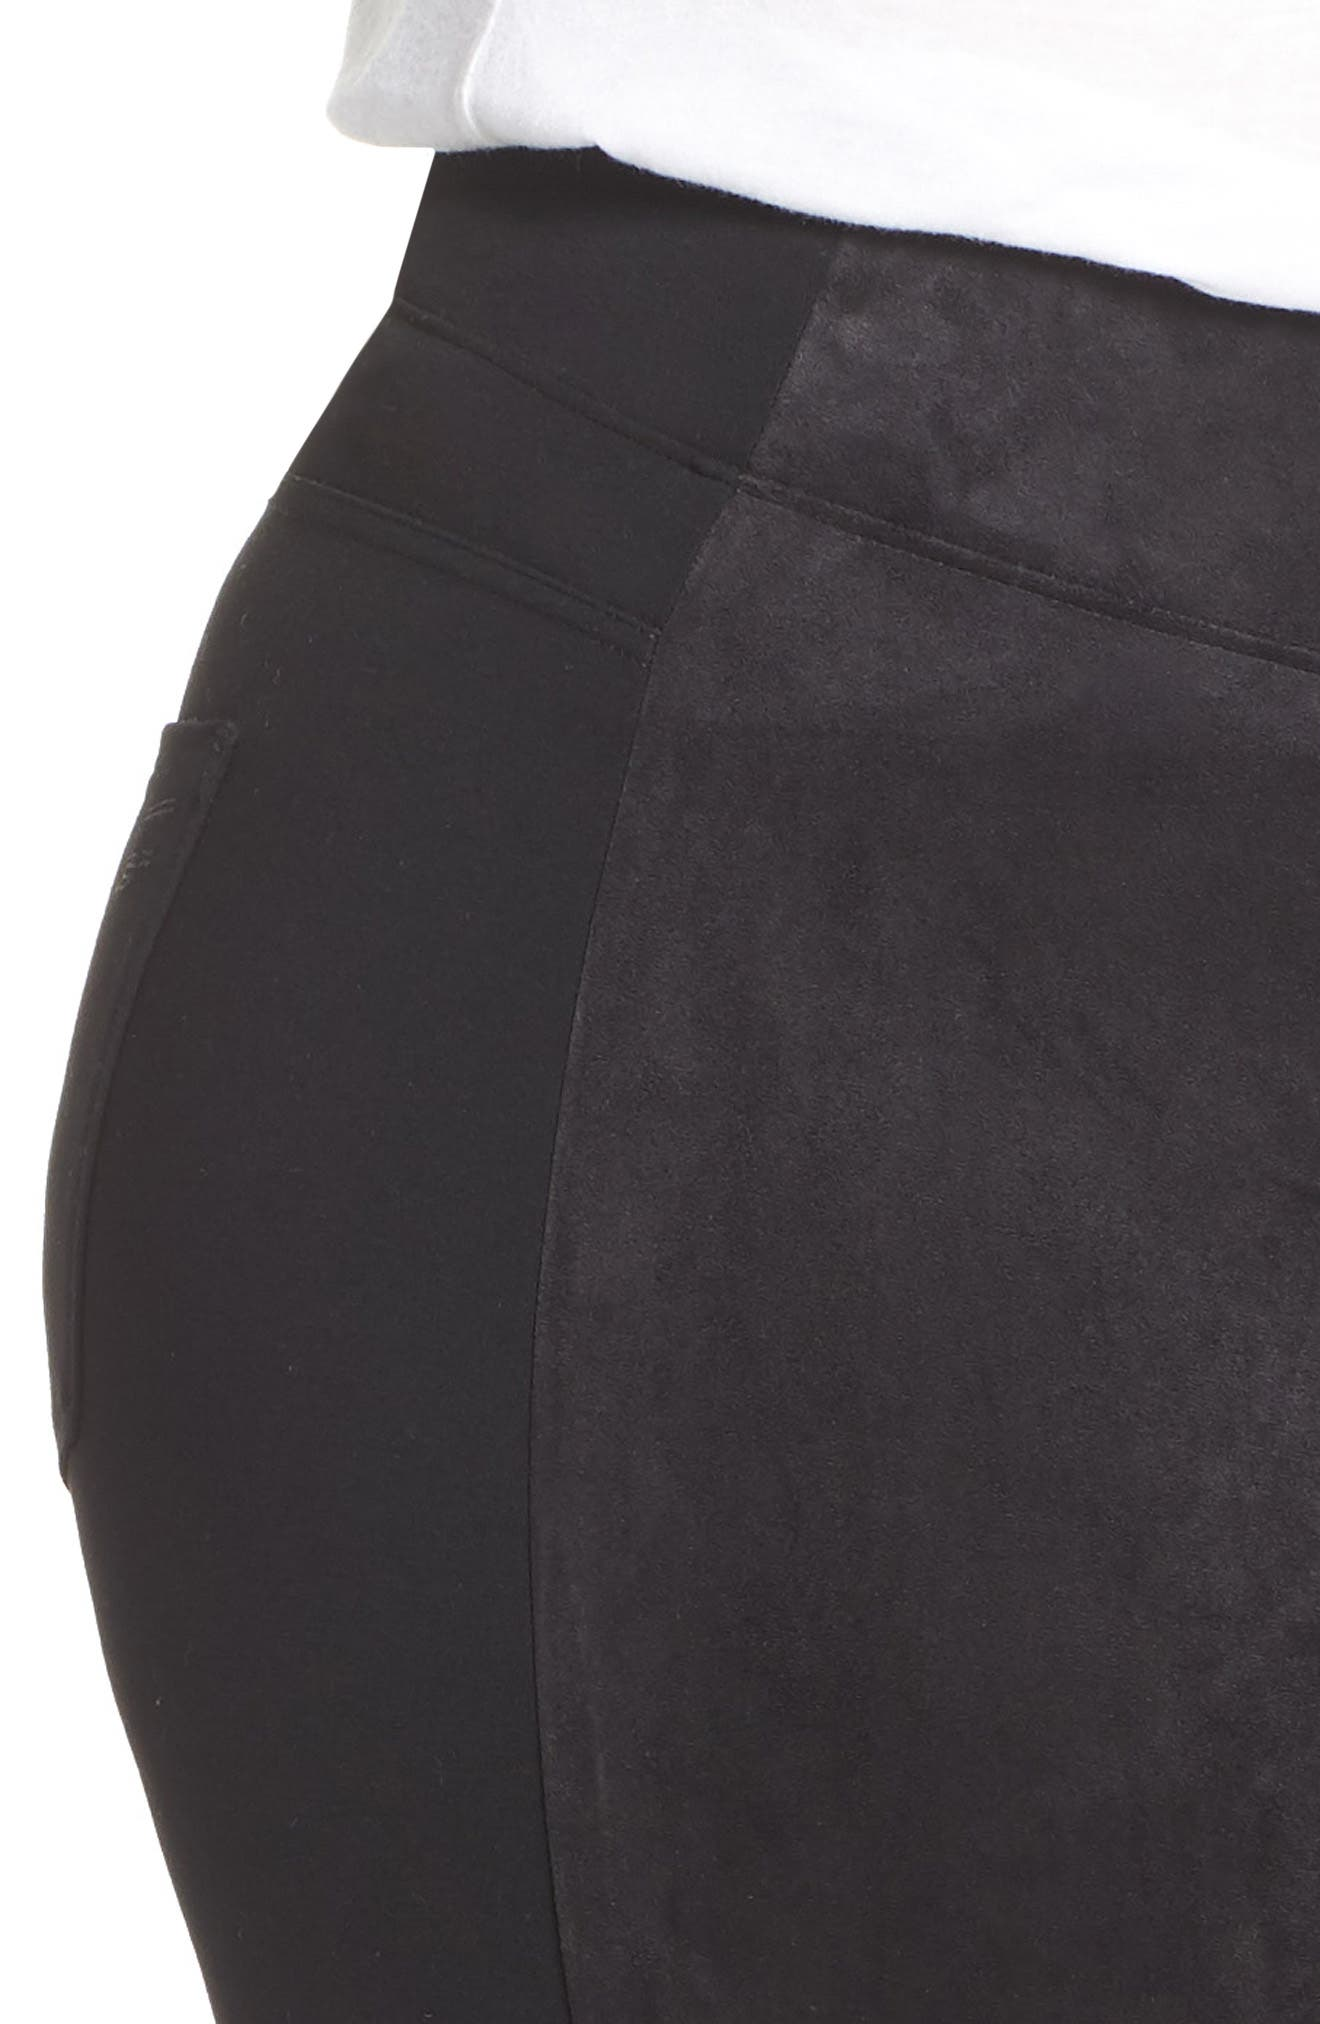 SEVEN7,                             High Rise Pull-On Vegan Leather Pants,                             Alternate thumbnail 4, color,                             CAVIAR